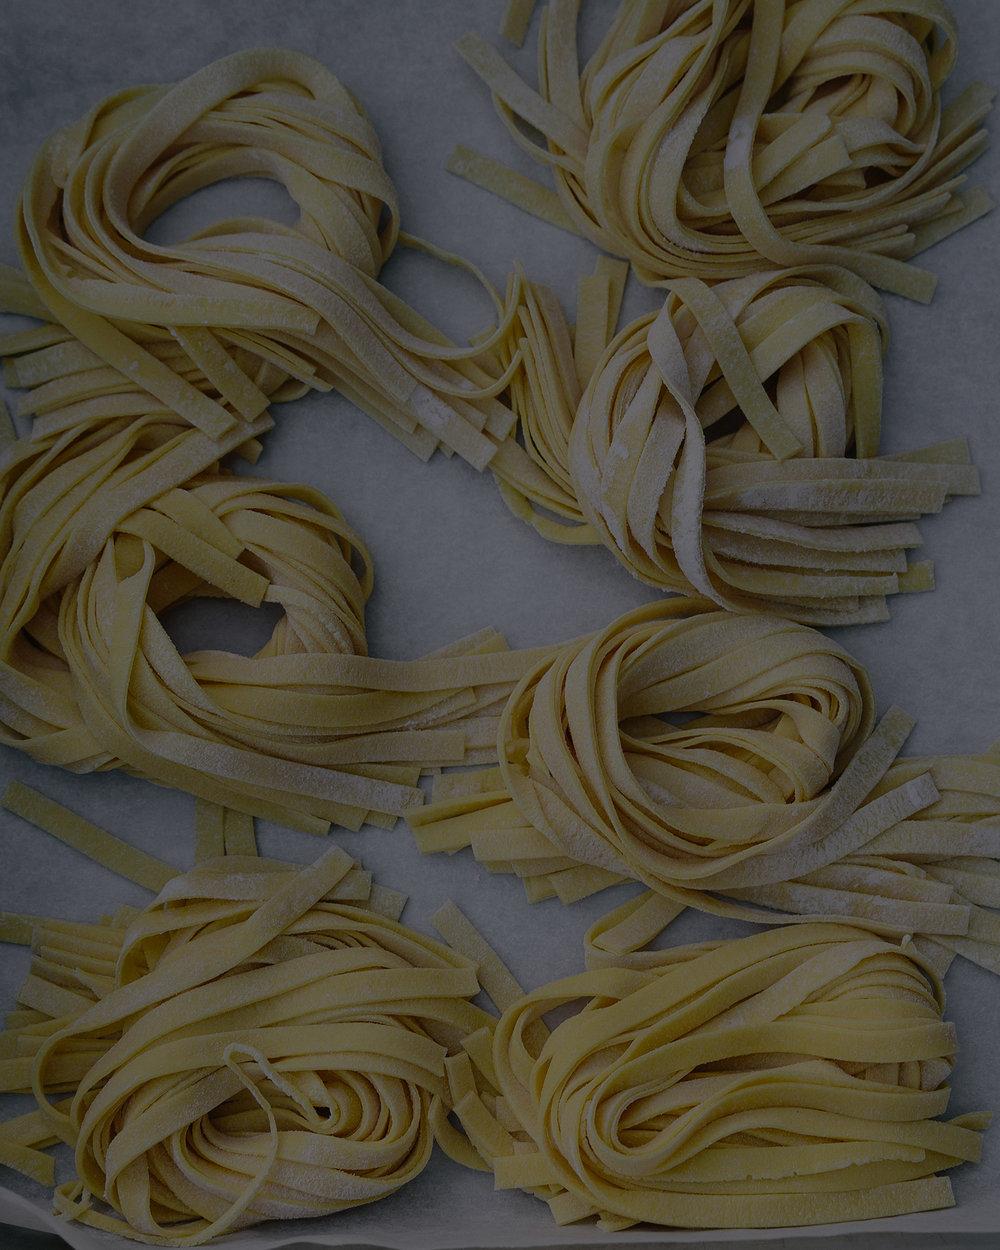 ITALY~EMILIA-ROMAGNA: BOLOGNA, MODENA, & PARMA -